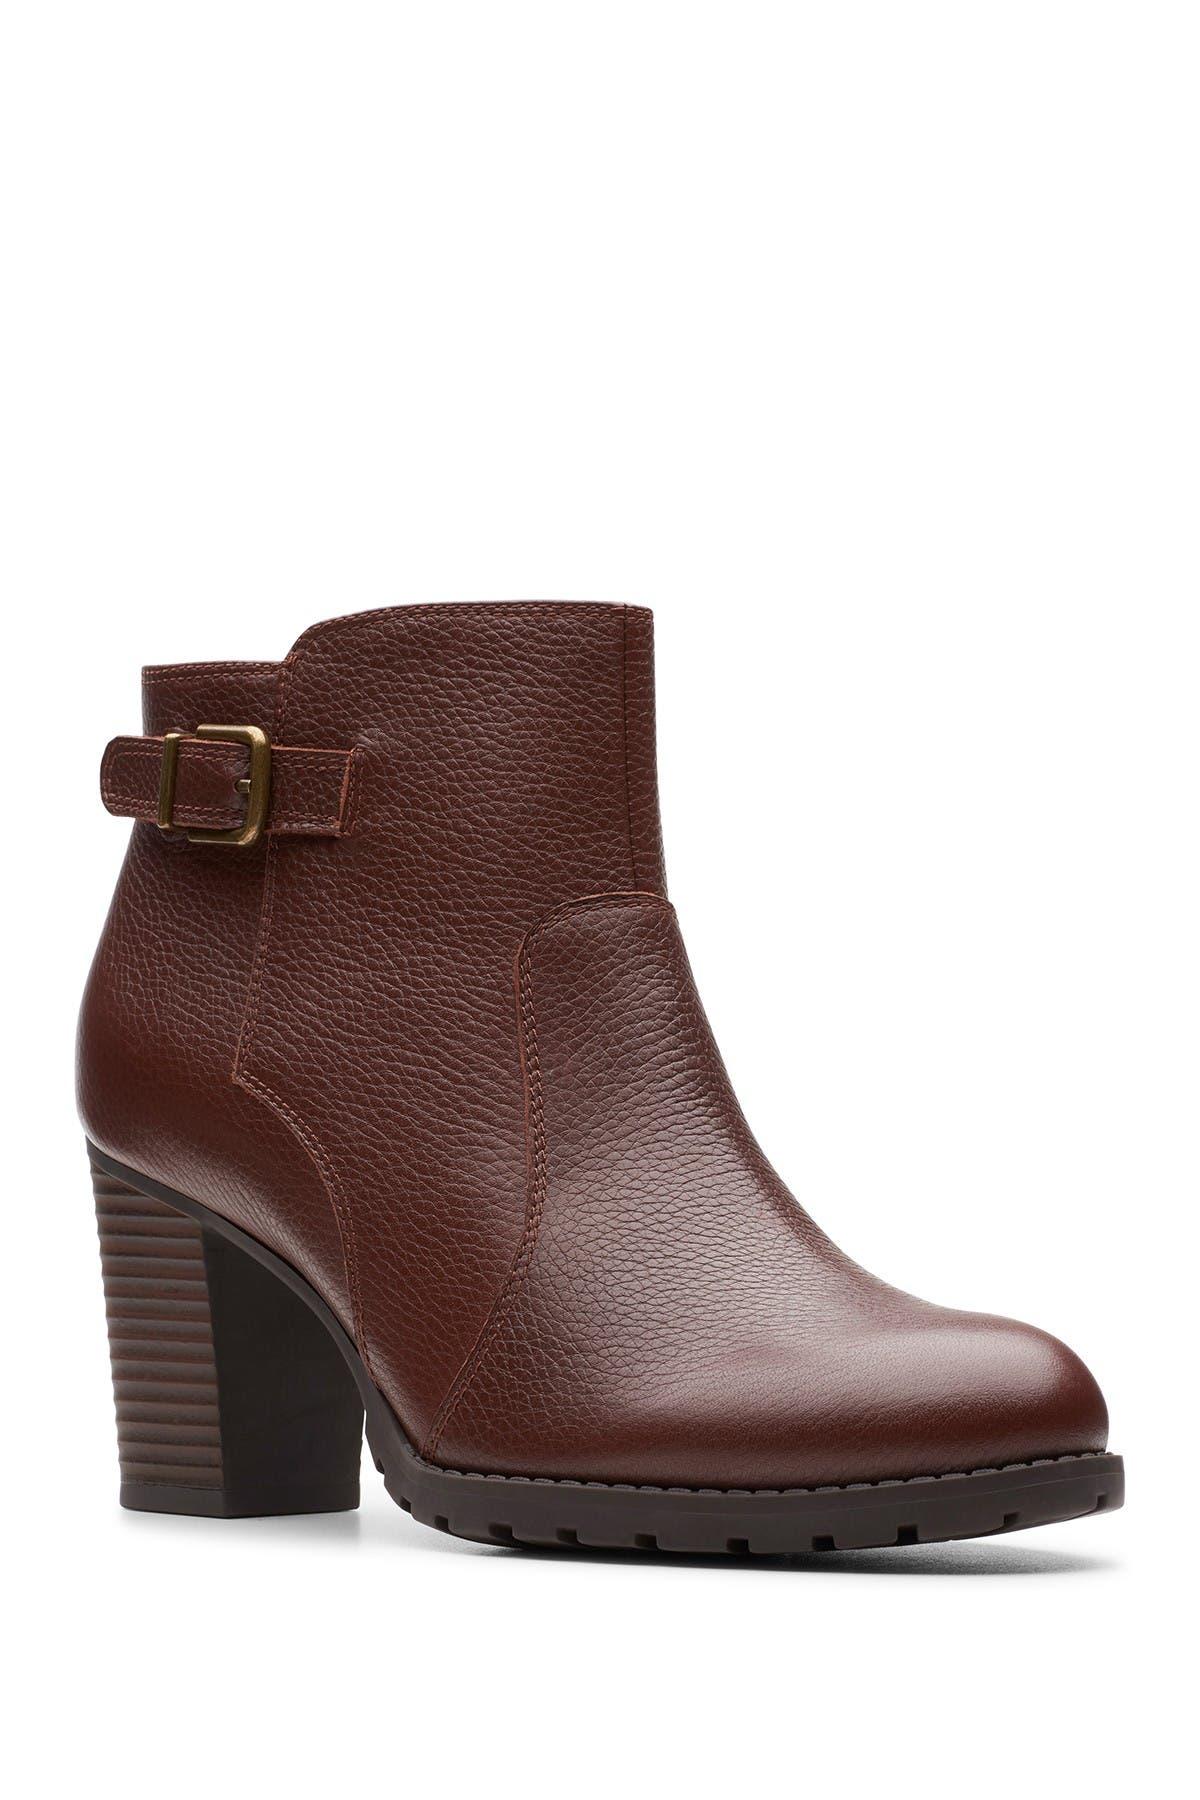 Image of Clarks Verona Gleam Leather Bootie